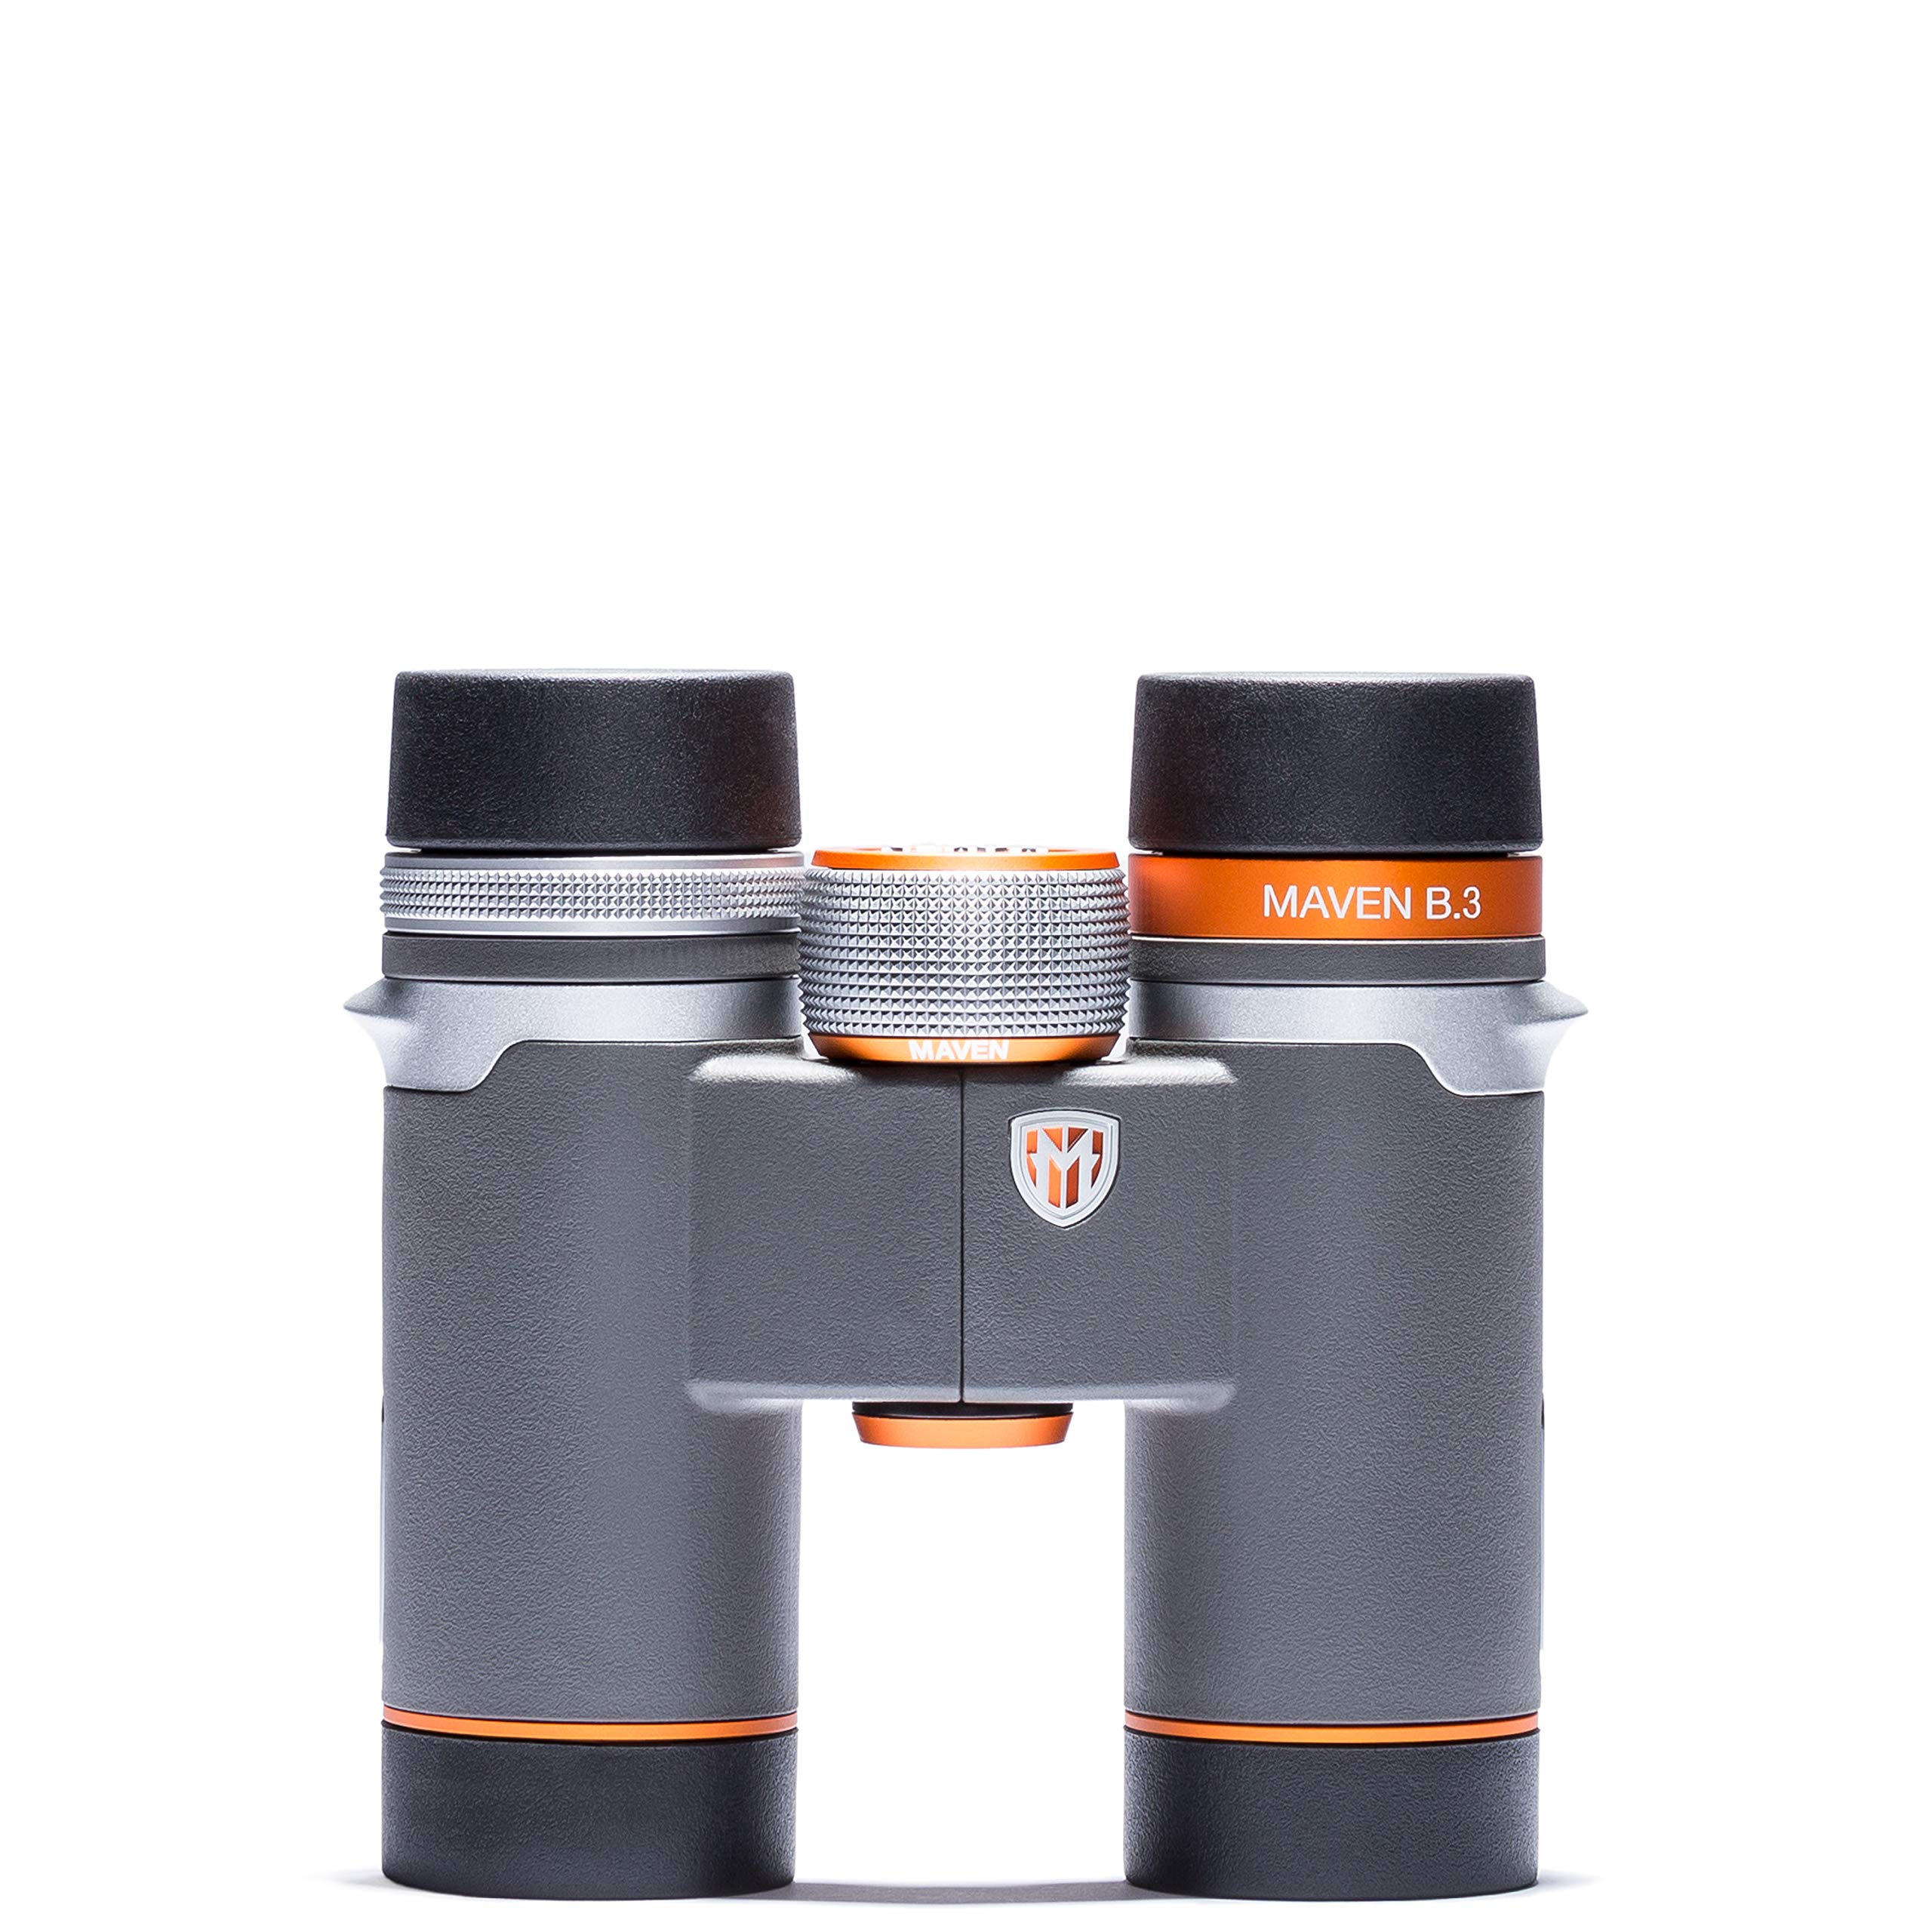 Maven B3 8X30mm ED Compact Binoculars Gray/Orange by Maven